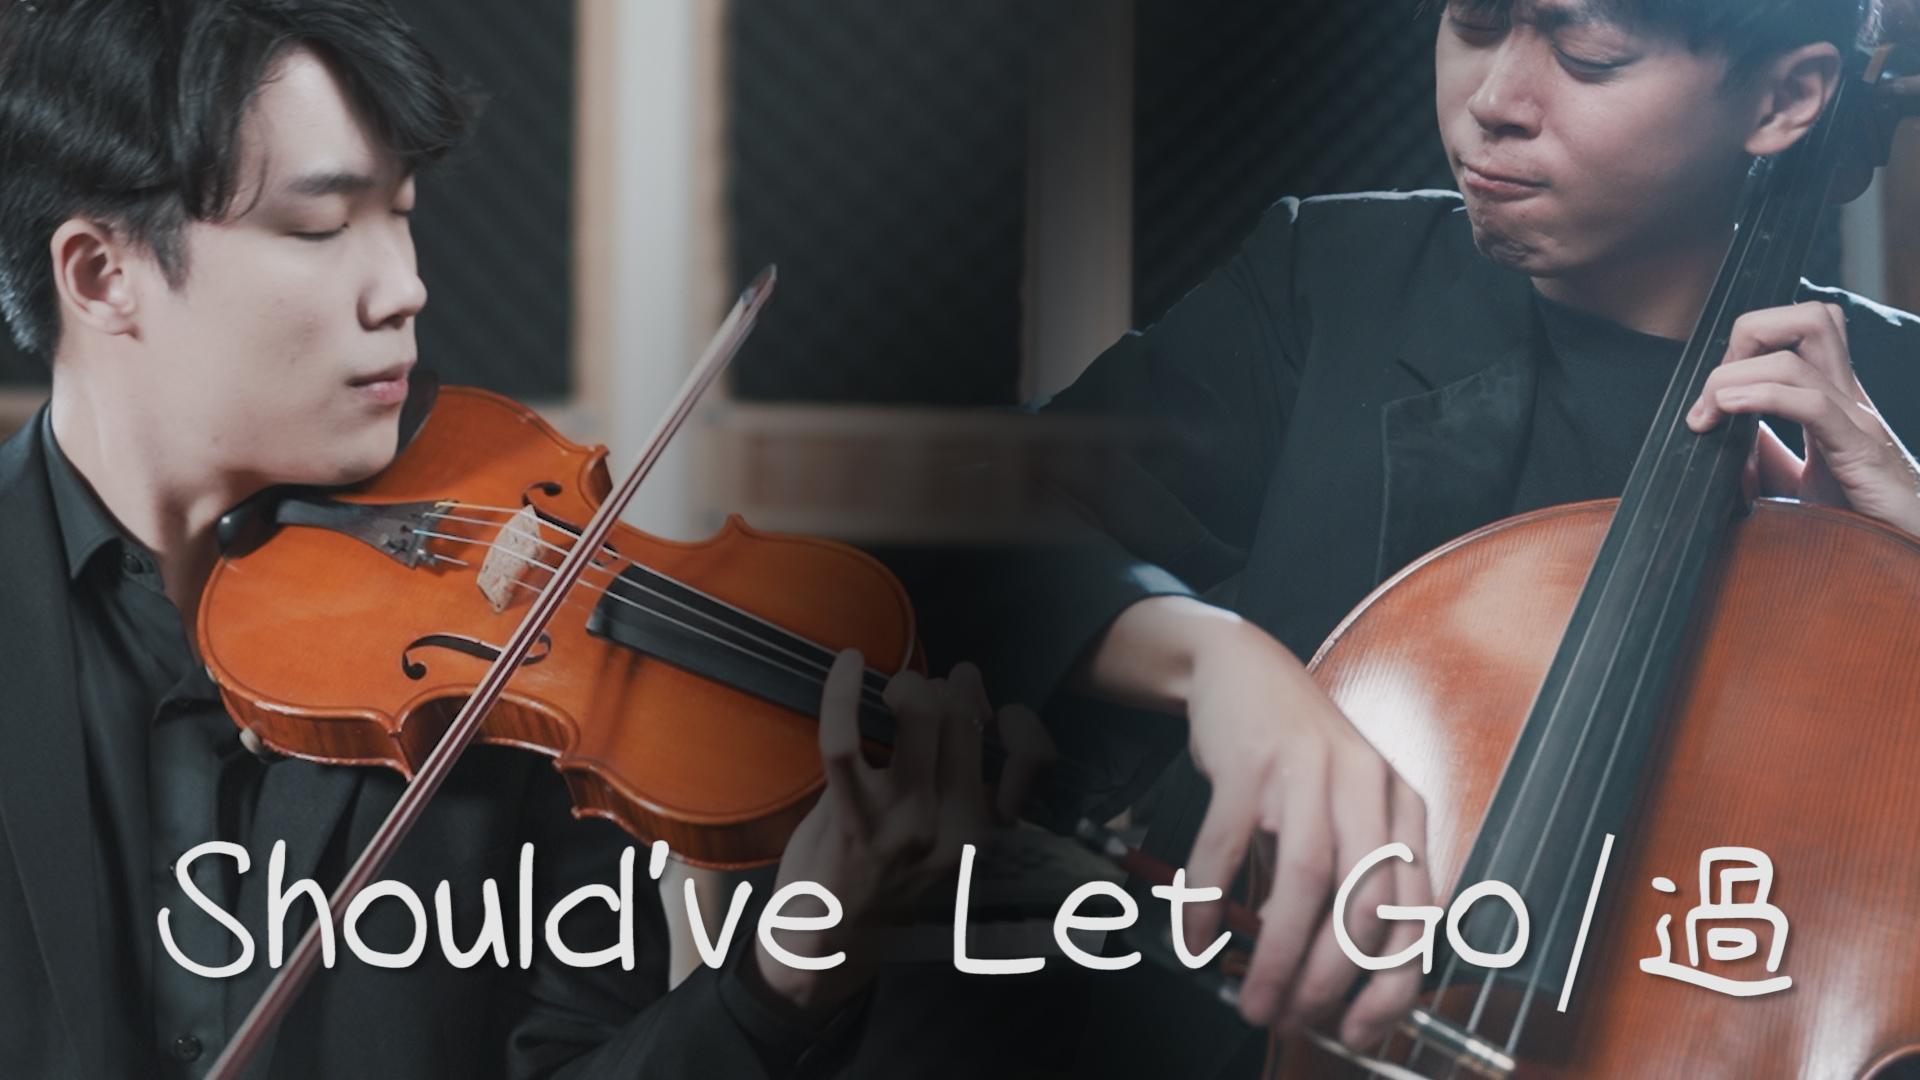 Should've Let Go  《過》王嘉爾 &林俊傑,  Cello and Violin duet by YoYo Cello Ft.@BoyViolin